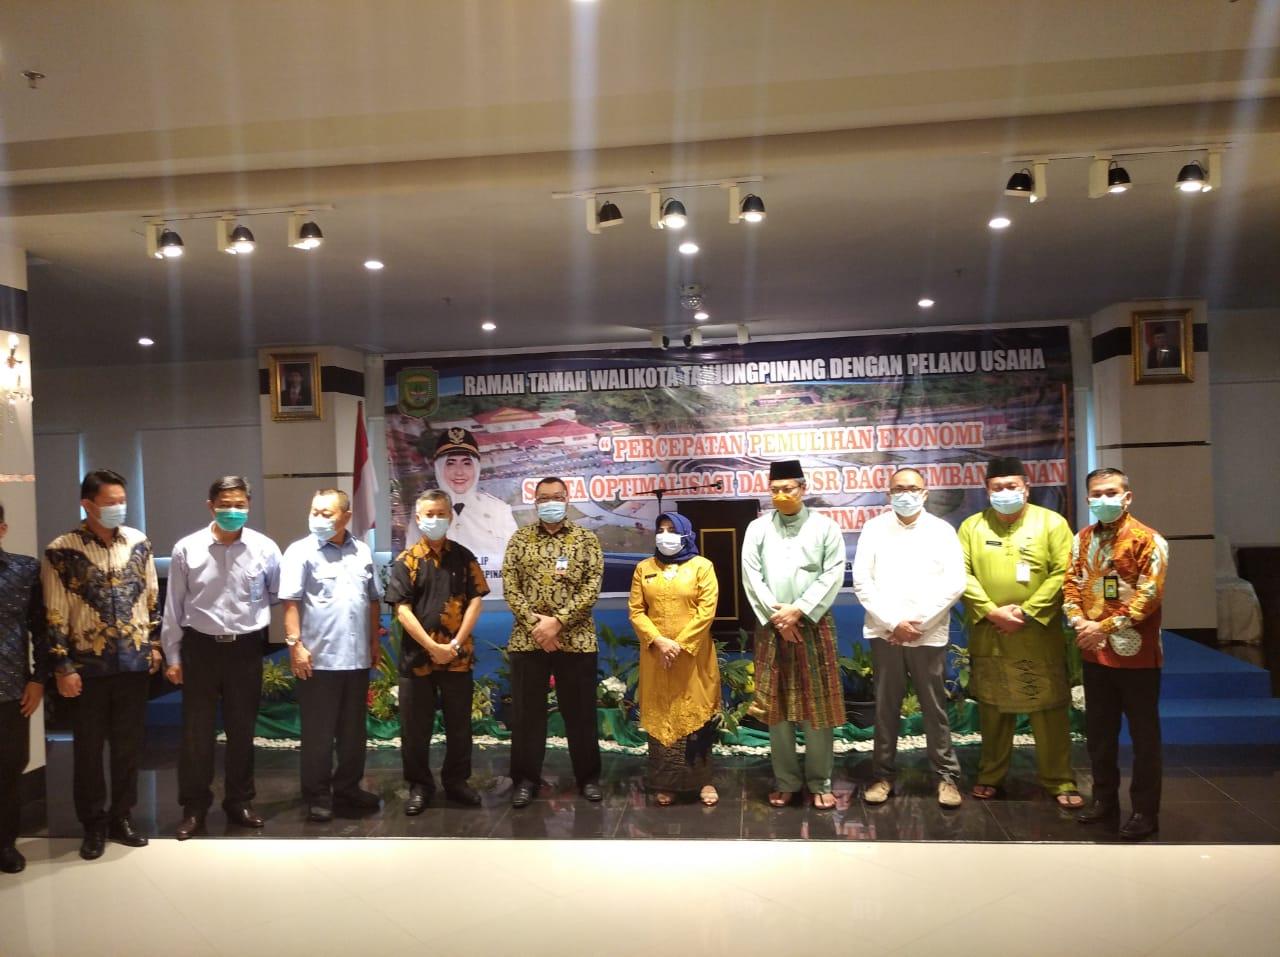 Walikota Tanjungpinang Menggelar Silaturahmi dan Rama Tamah Dengan 50  Para Pelaku Usaha